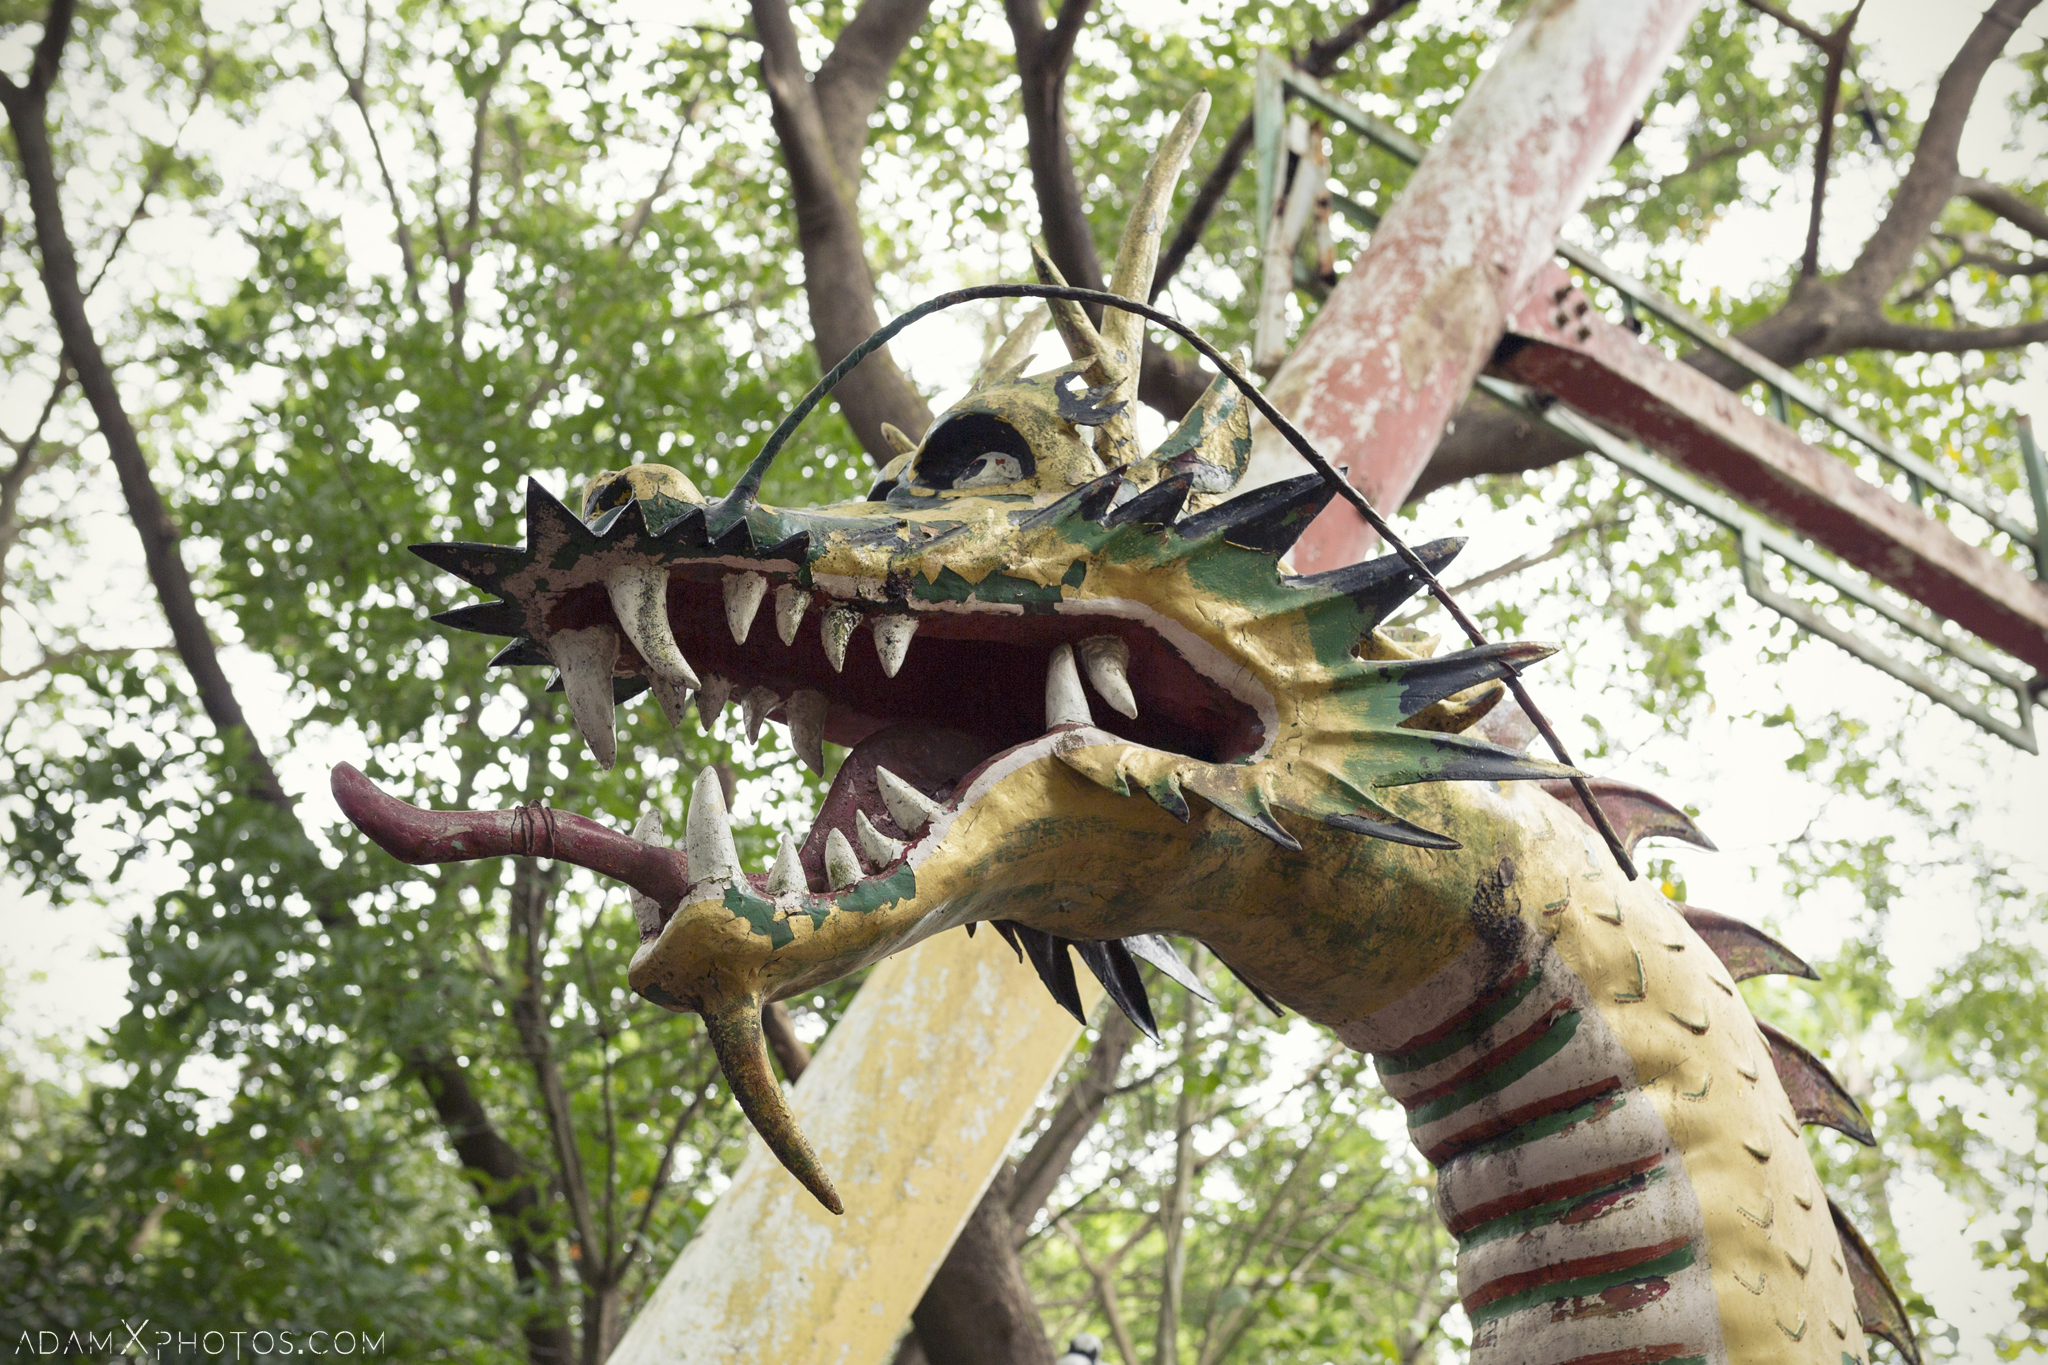 Dragon Happy World Theme Park Amusement Park Fairground Myanmar Burma Yangon Rangoon Urbex Adam X Urban Exploration Access 2016 Abandoned decay lost forgotten derelict location creepy haunting eerie